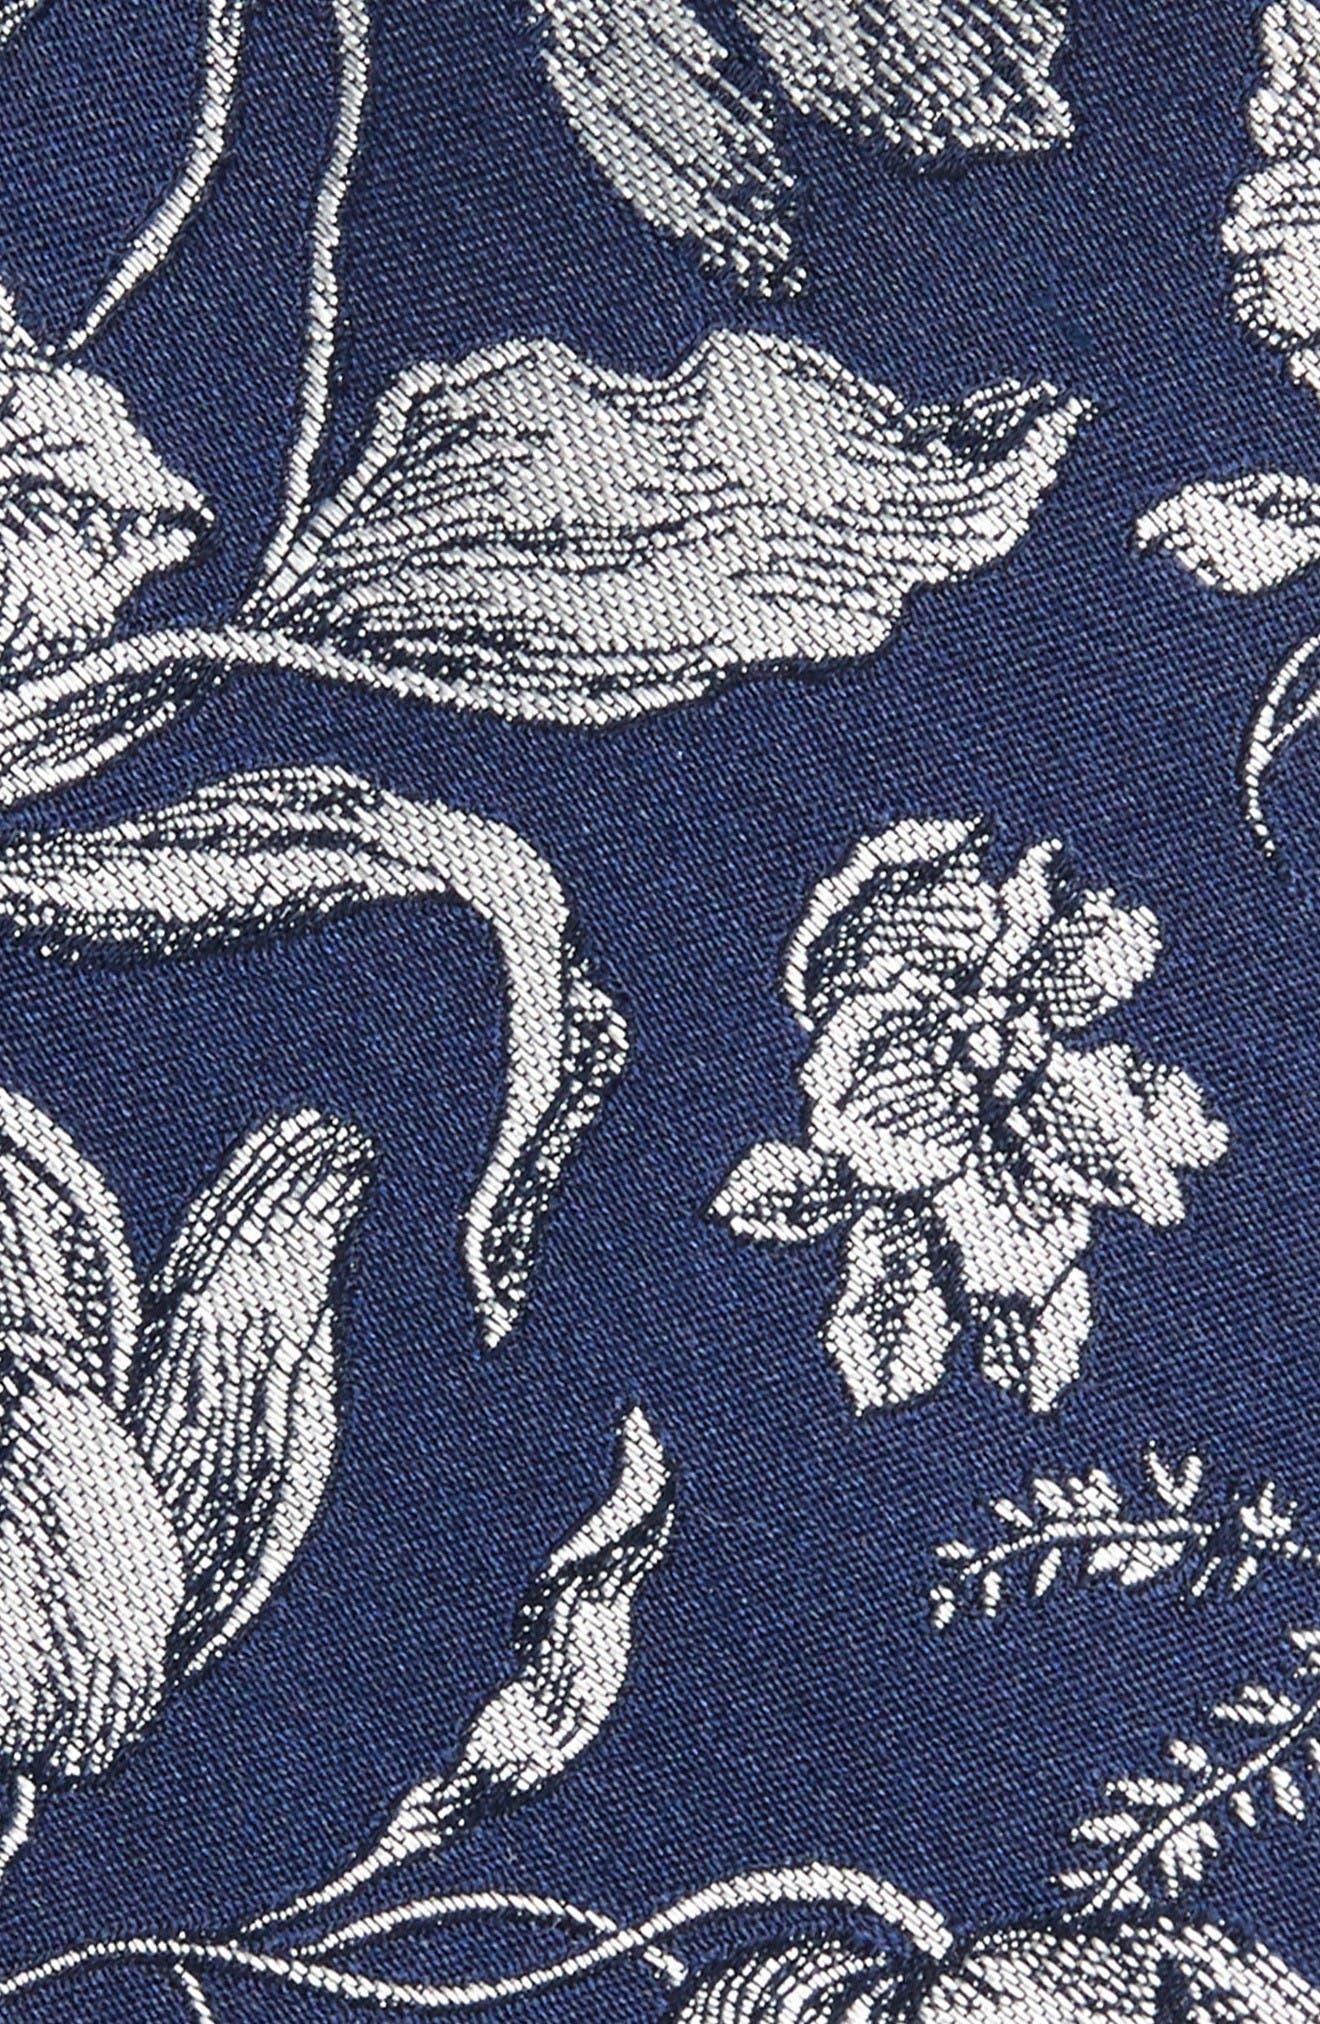 Alternate Image 2  - The Tie Bar Floral Swell Silk Skinny Tie